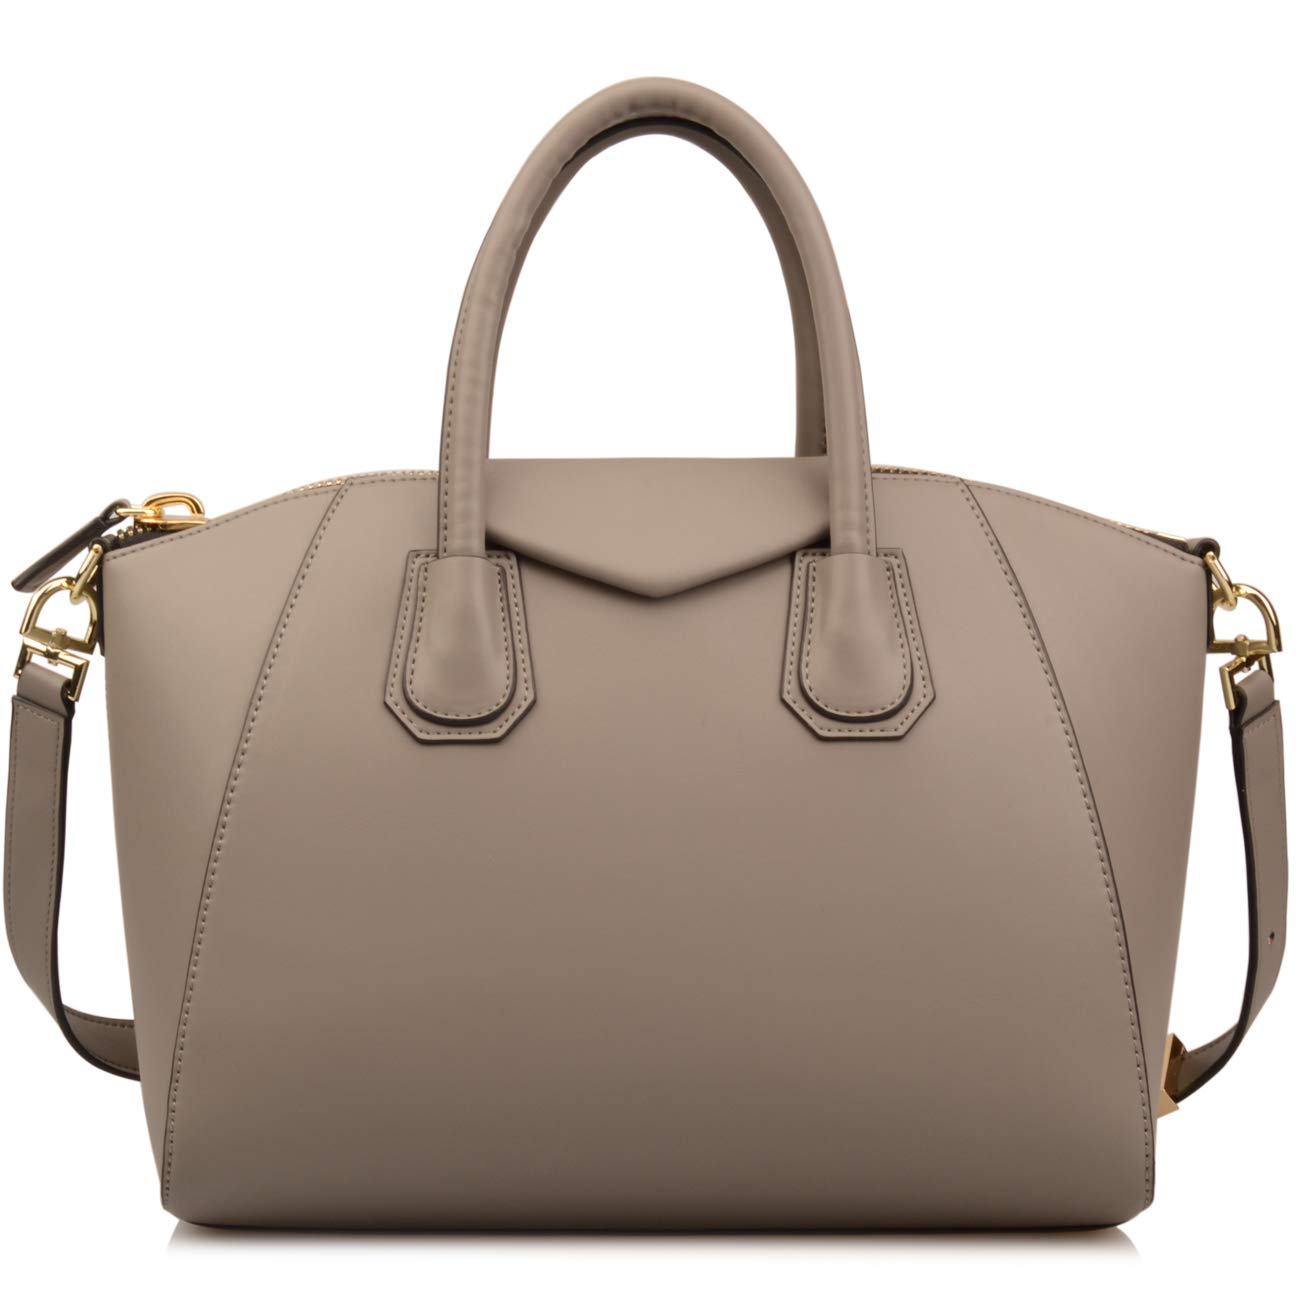 Ainifeel Women's Genuine Leather Everyday Purse Top Handle Handbags Shoulder Bags (Medium, Dark grey)